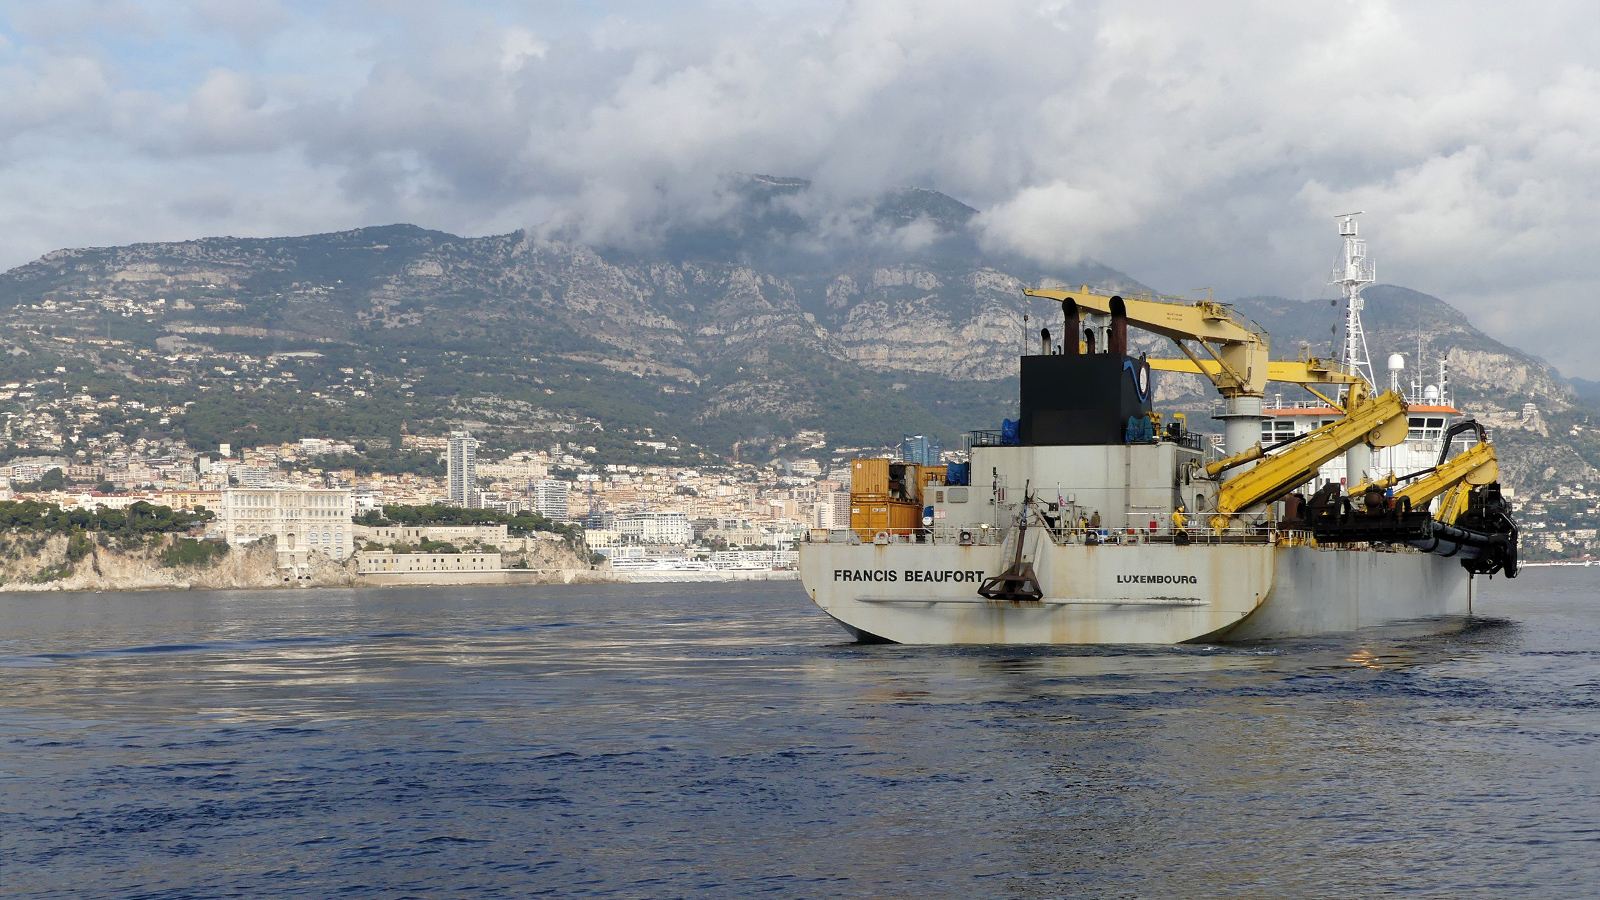 Extension-en-mer-Francis-Beaufort-@-MH-Sophie-1.-Francis-Beaufort-P1070334